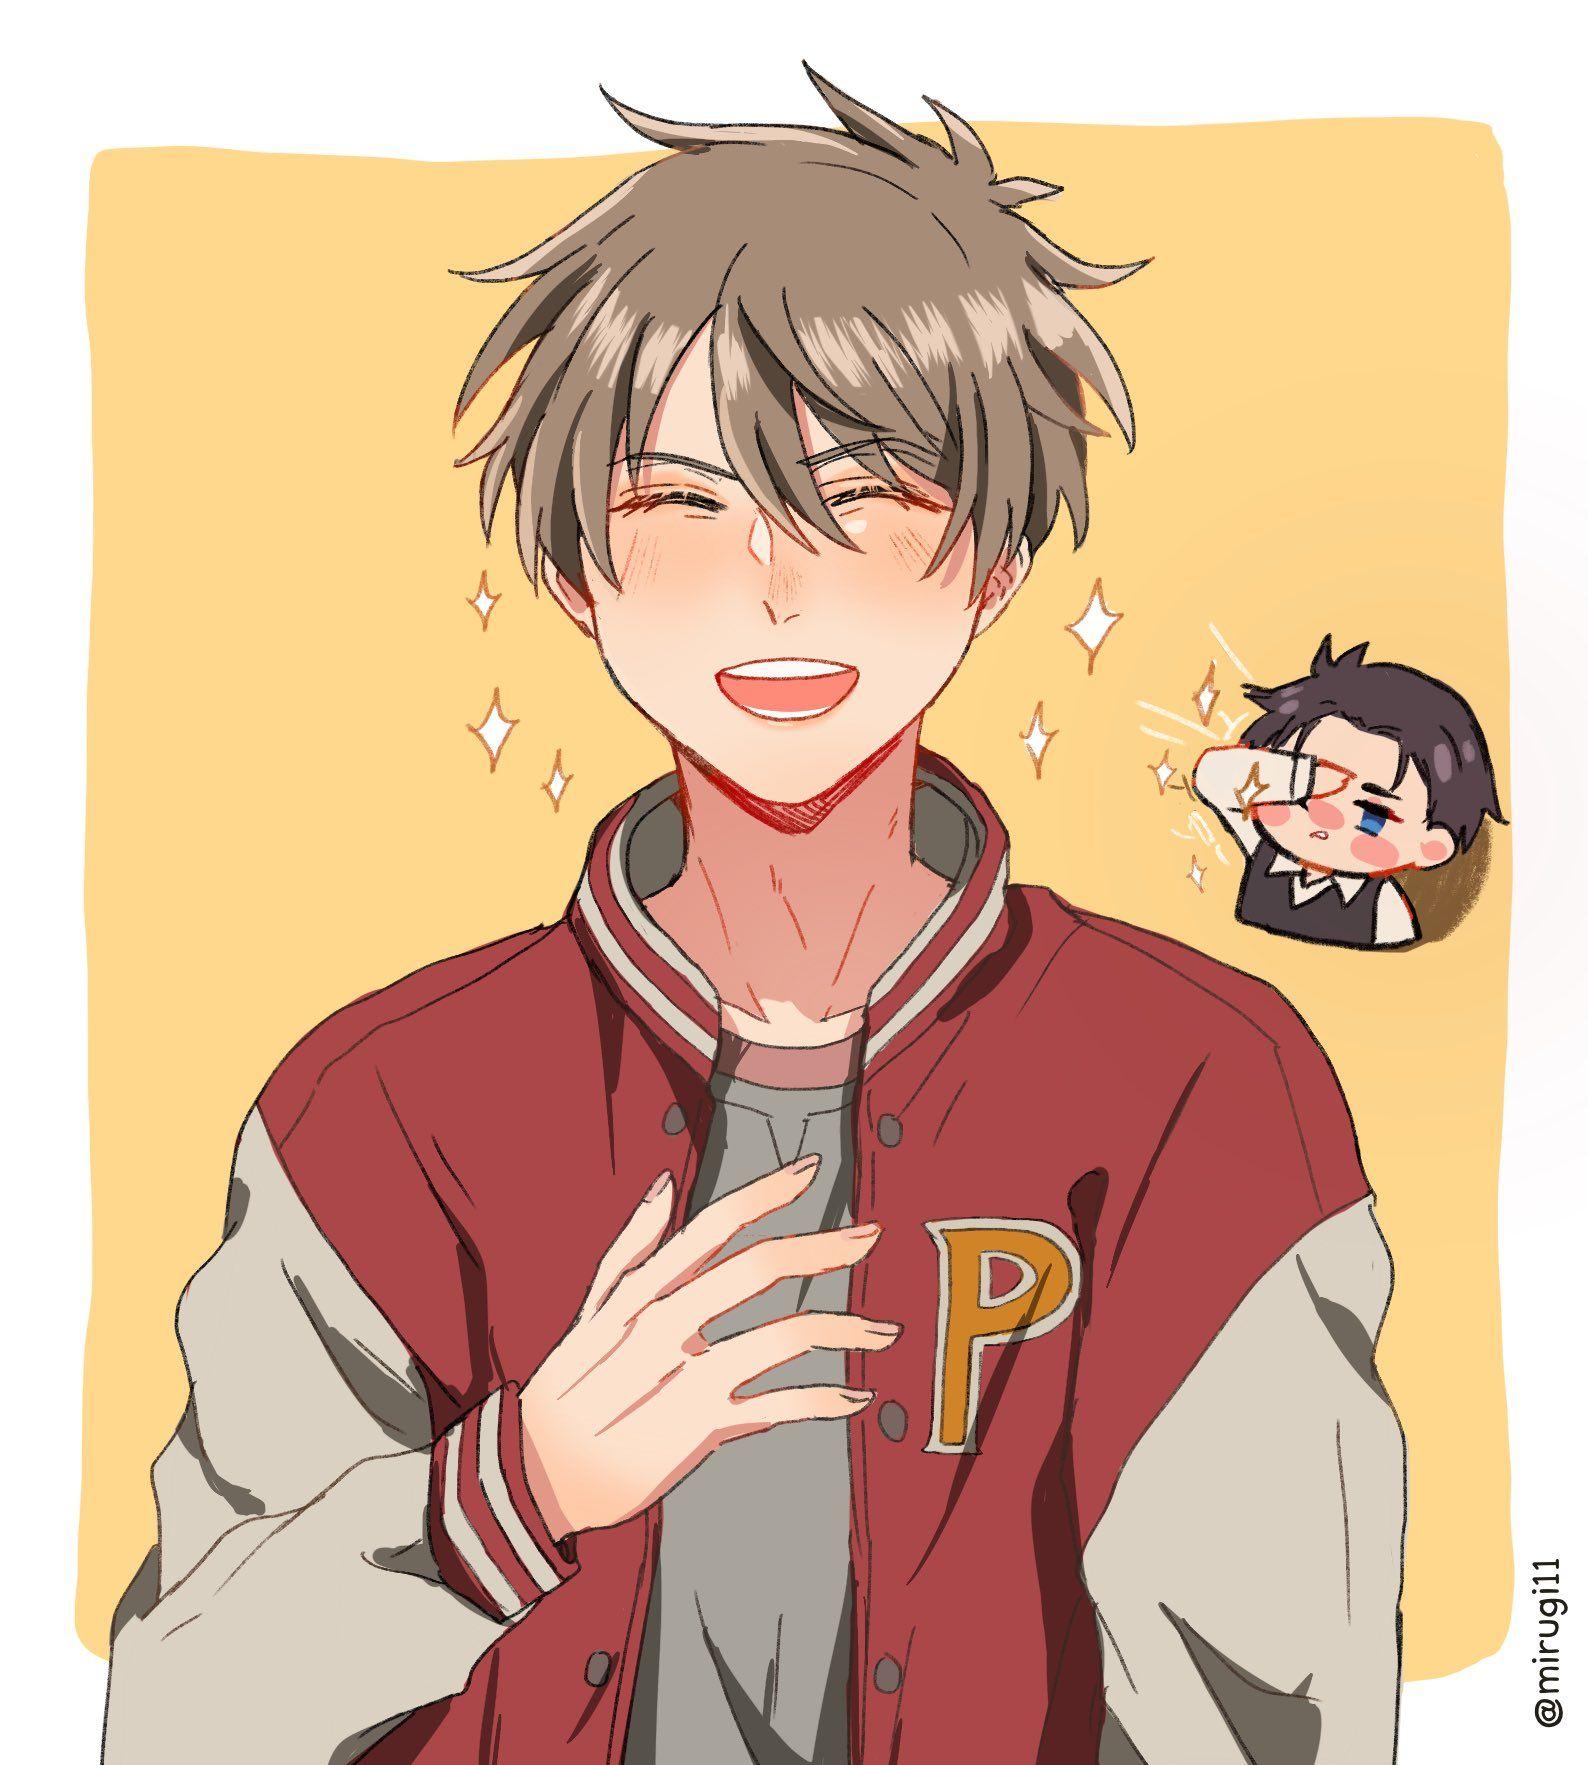 Mirugi On Twitter Detective Aesthetic Detective Anime Boy